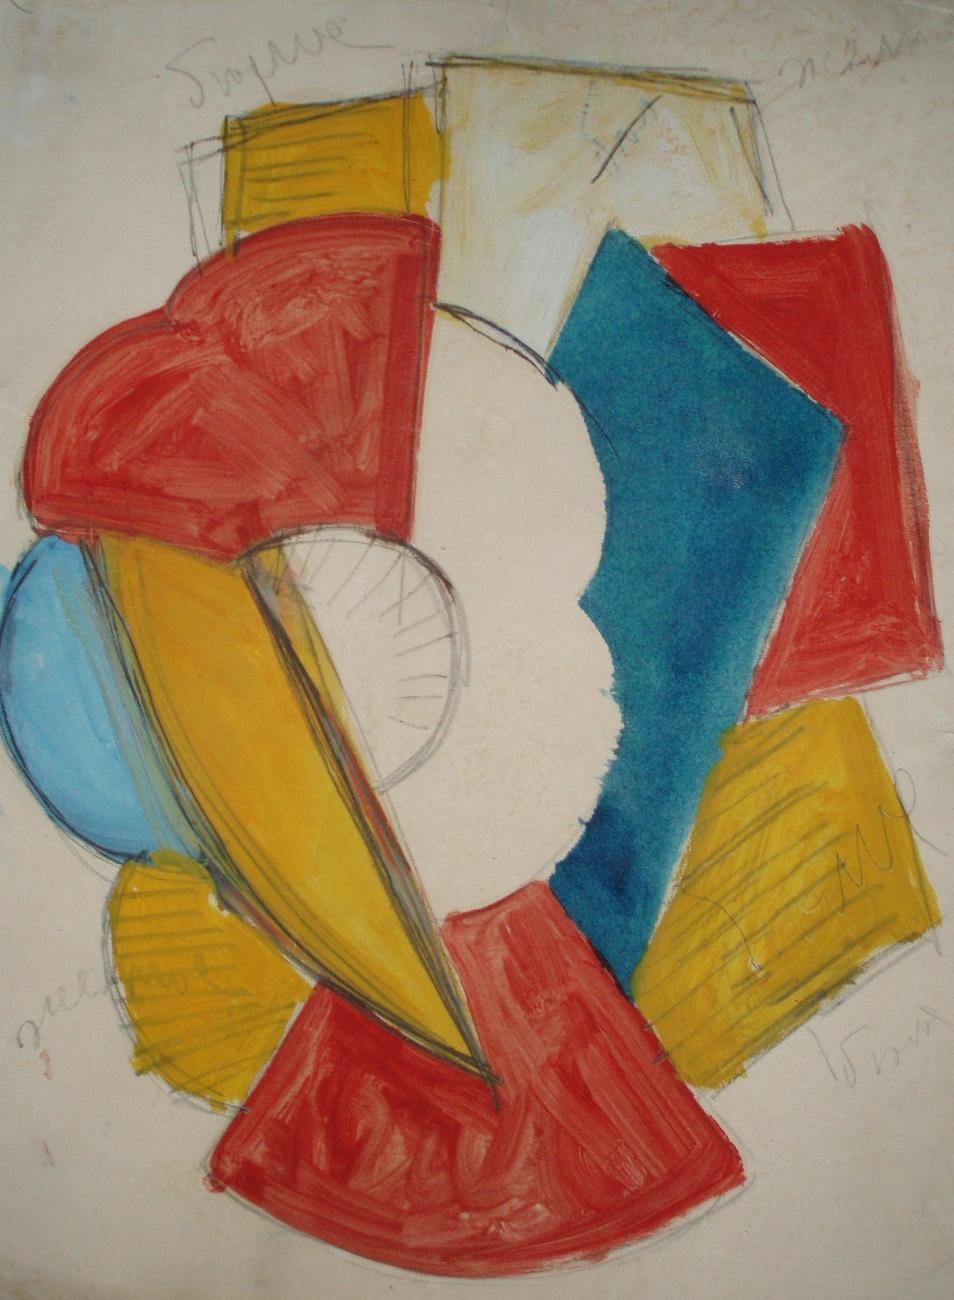 Constructivist Composition, 1916 - Vera Pestel